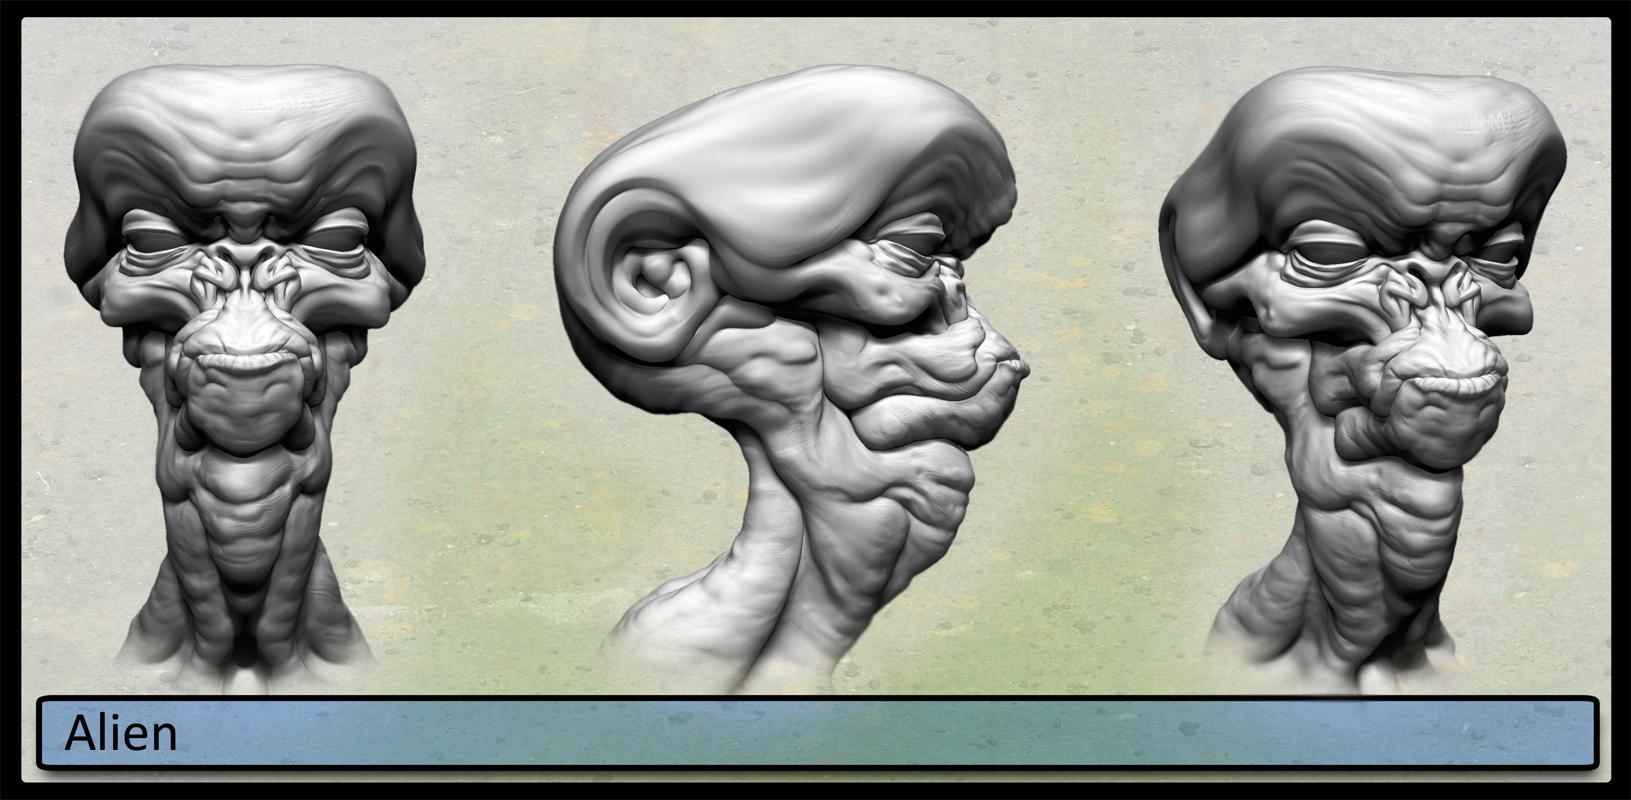 alien 01 - con sesion de modelado  si interesa -alien_characterstrip.jpg